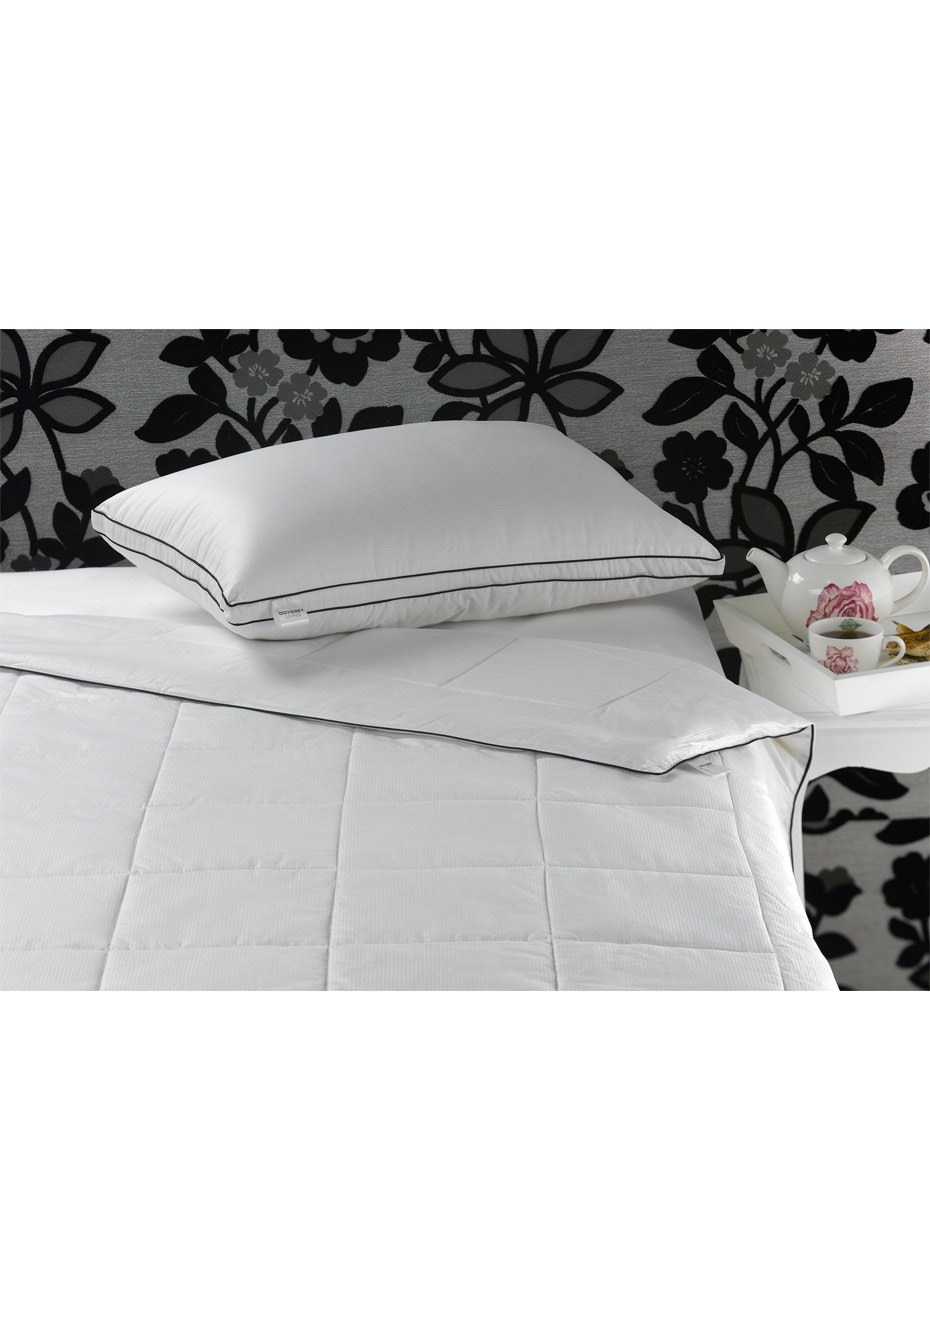 Silk Blend Cotton Quilt - King Bed